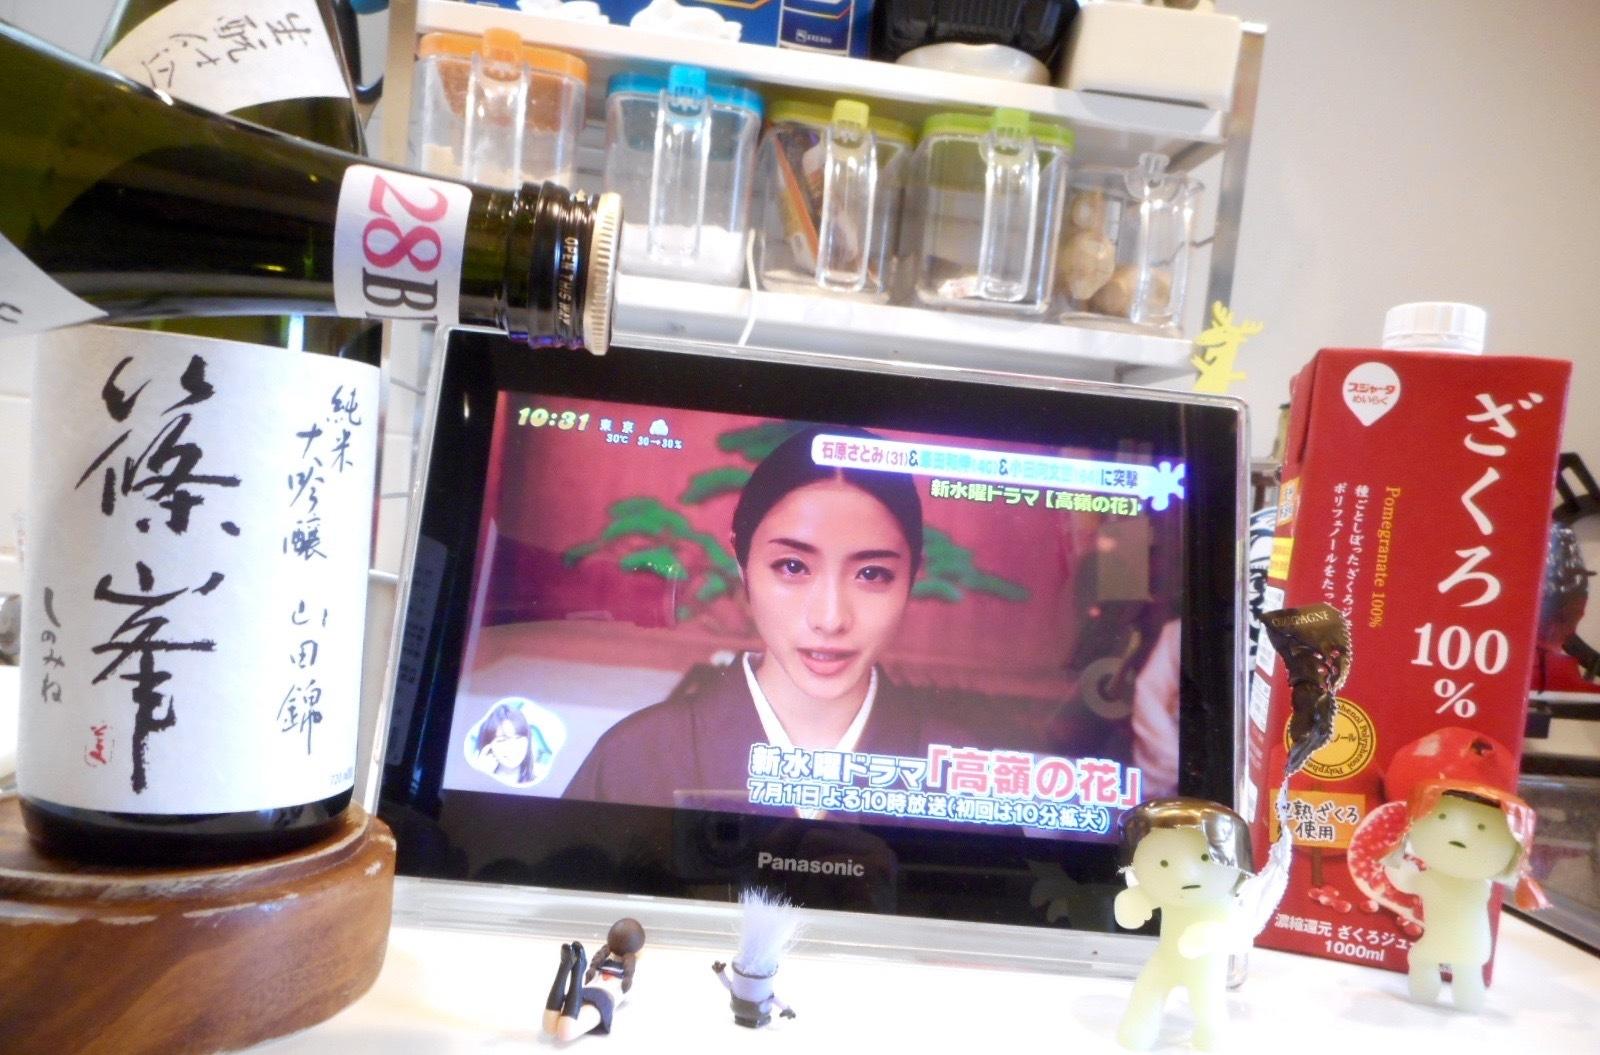 shinomine_kimoto_jundai28by1.jpg